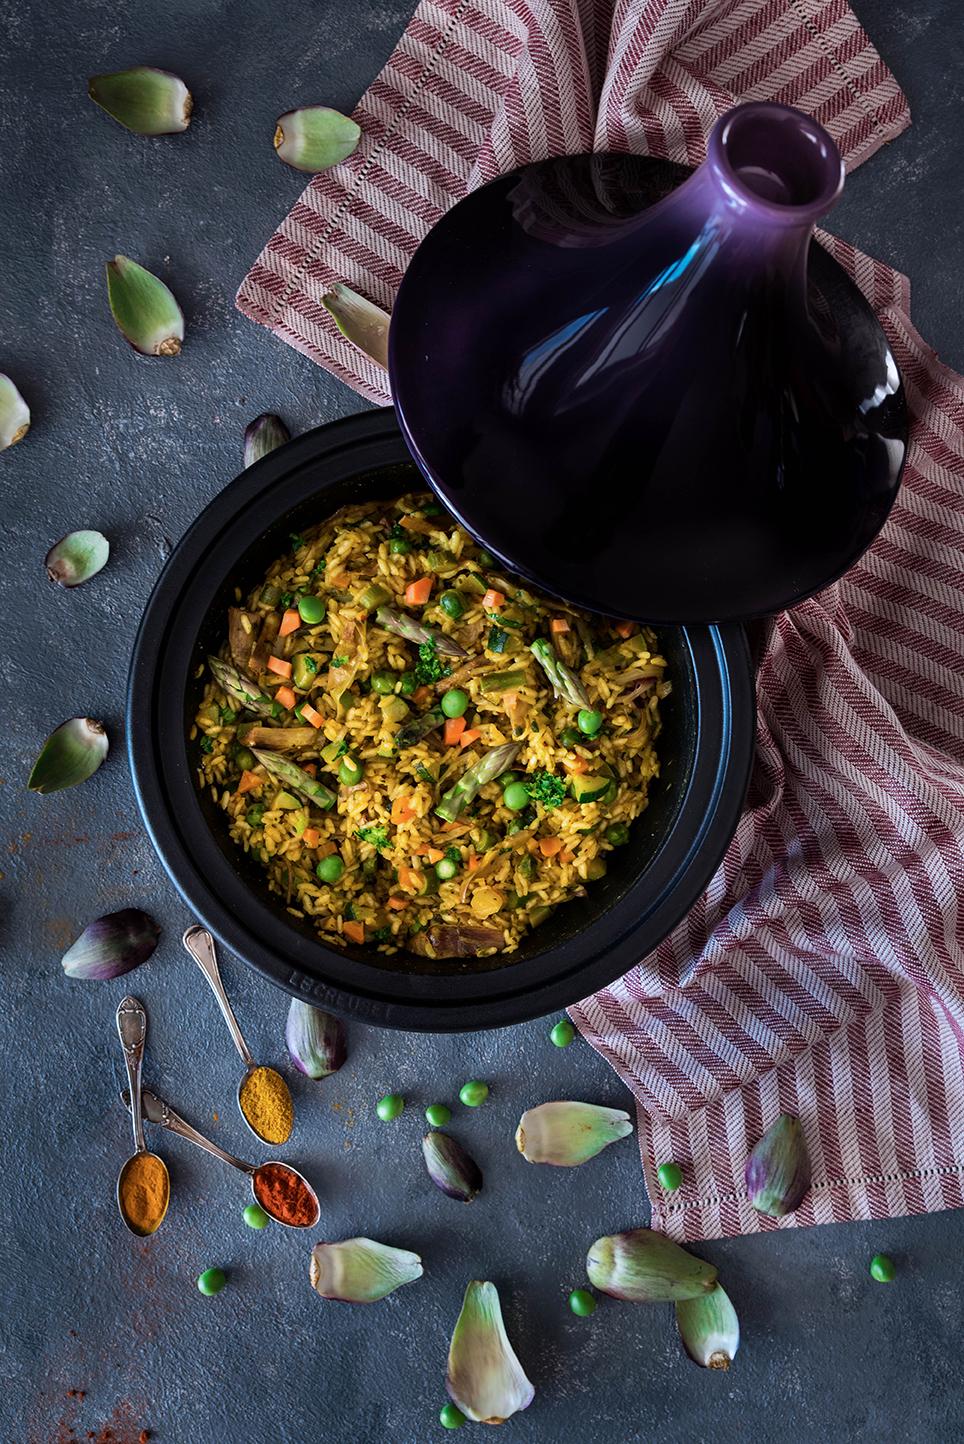 Spezie Marocchine Per Tajine.Riso In Tajine Con Verdure Primaverili E Spezie